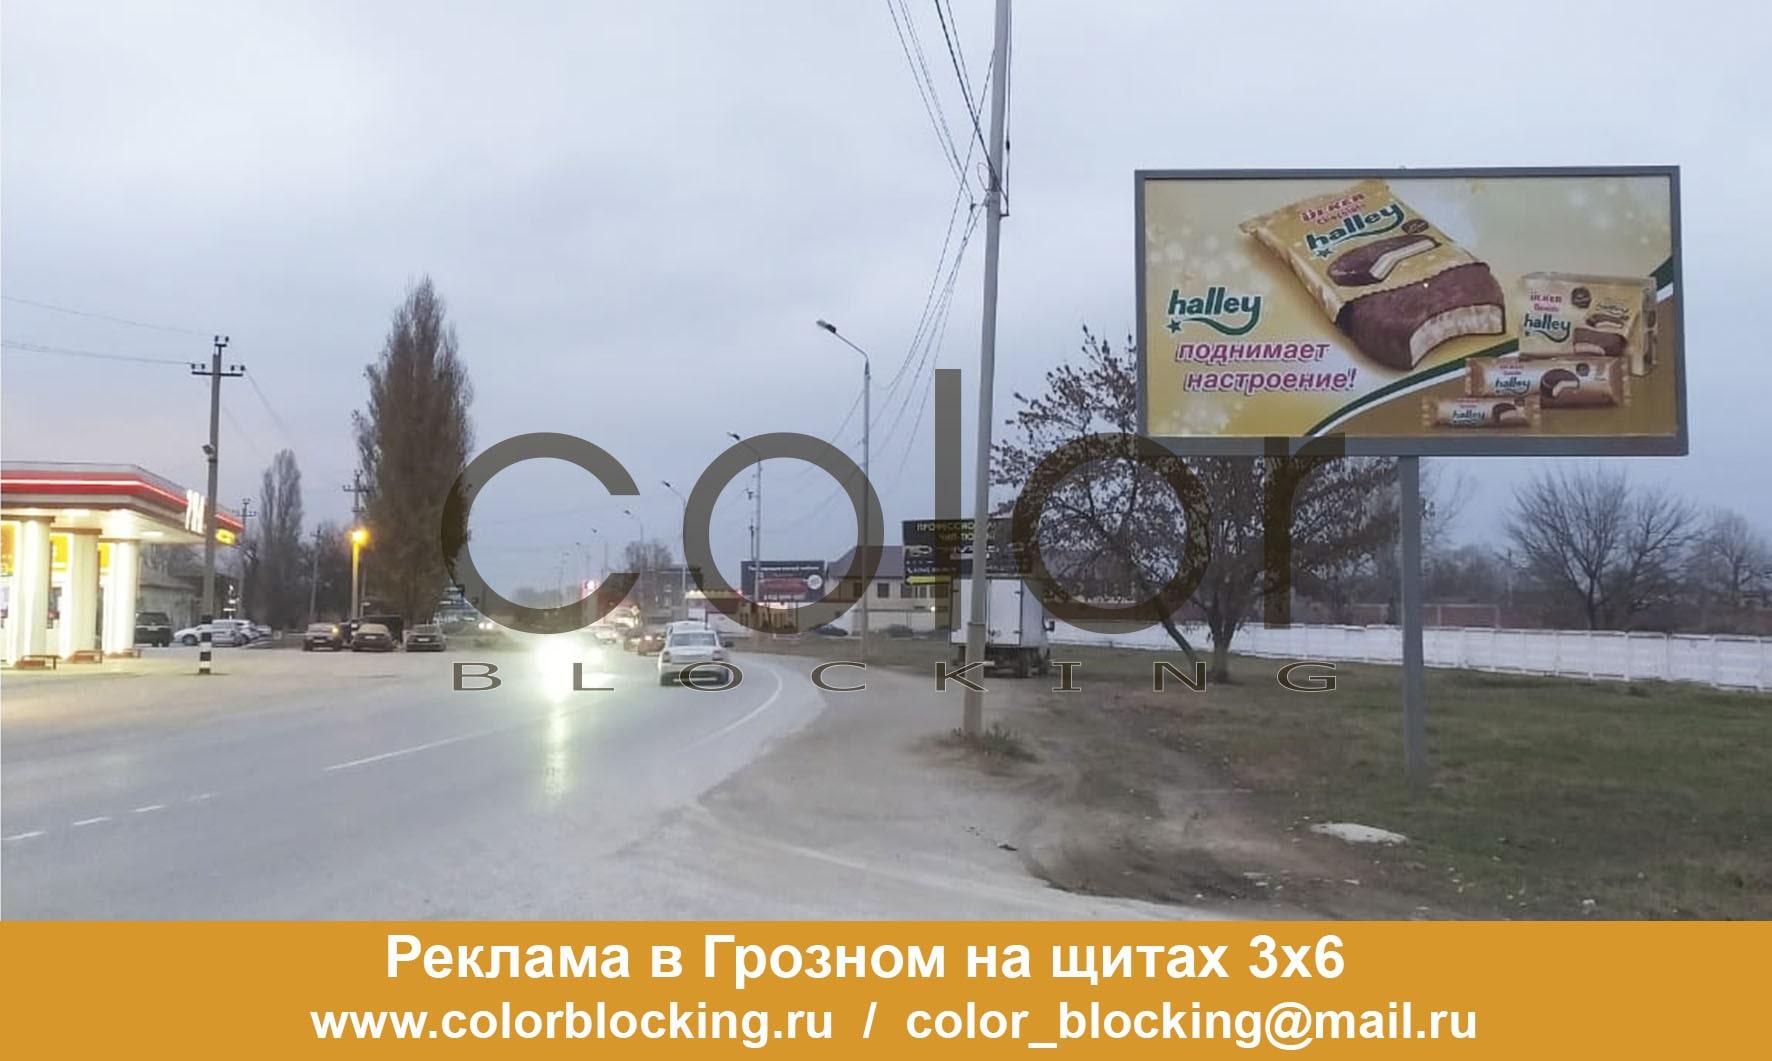 Реклама в Грозном на щитах 3х6 шоссе